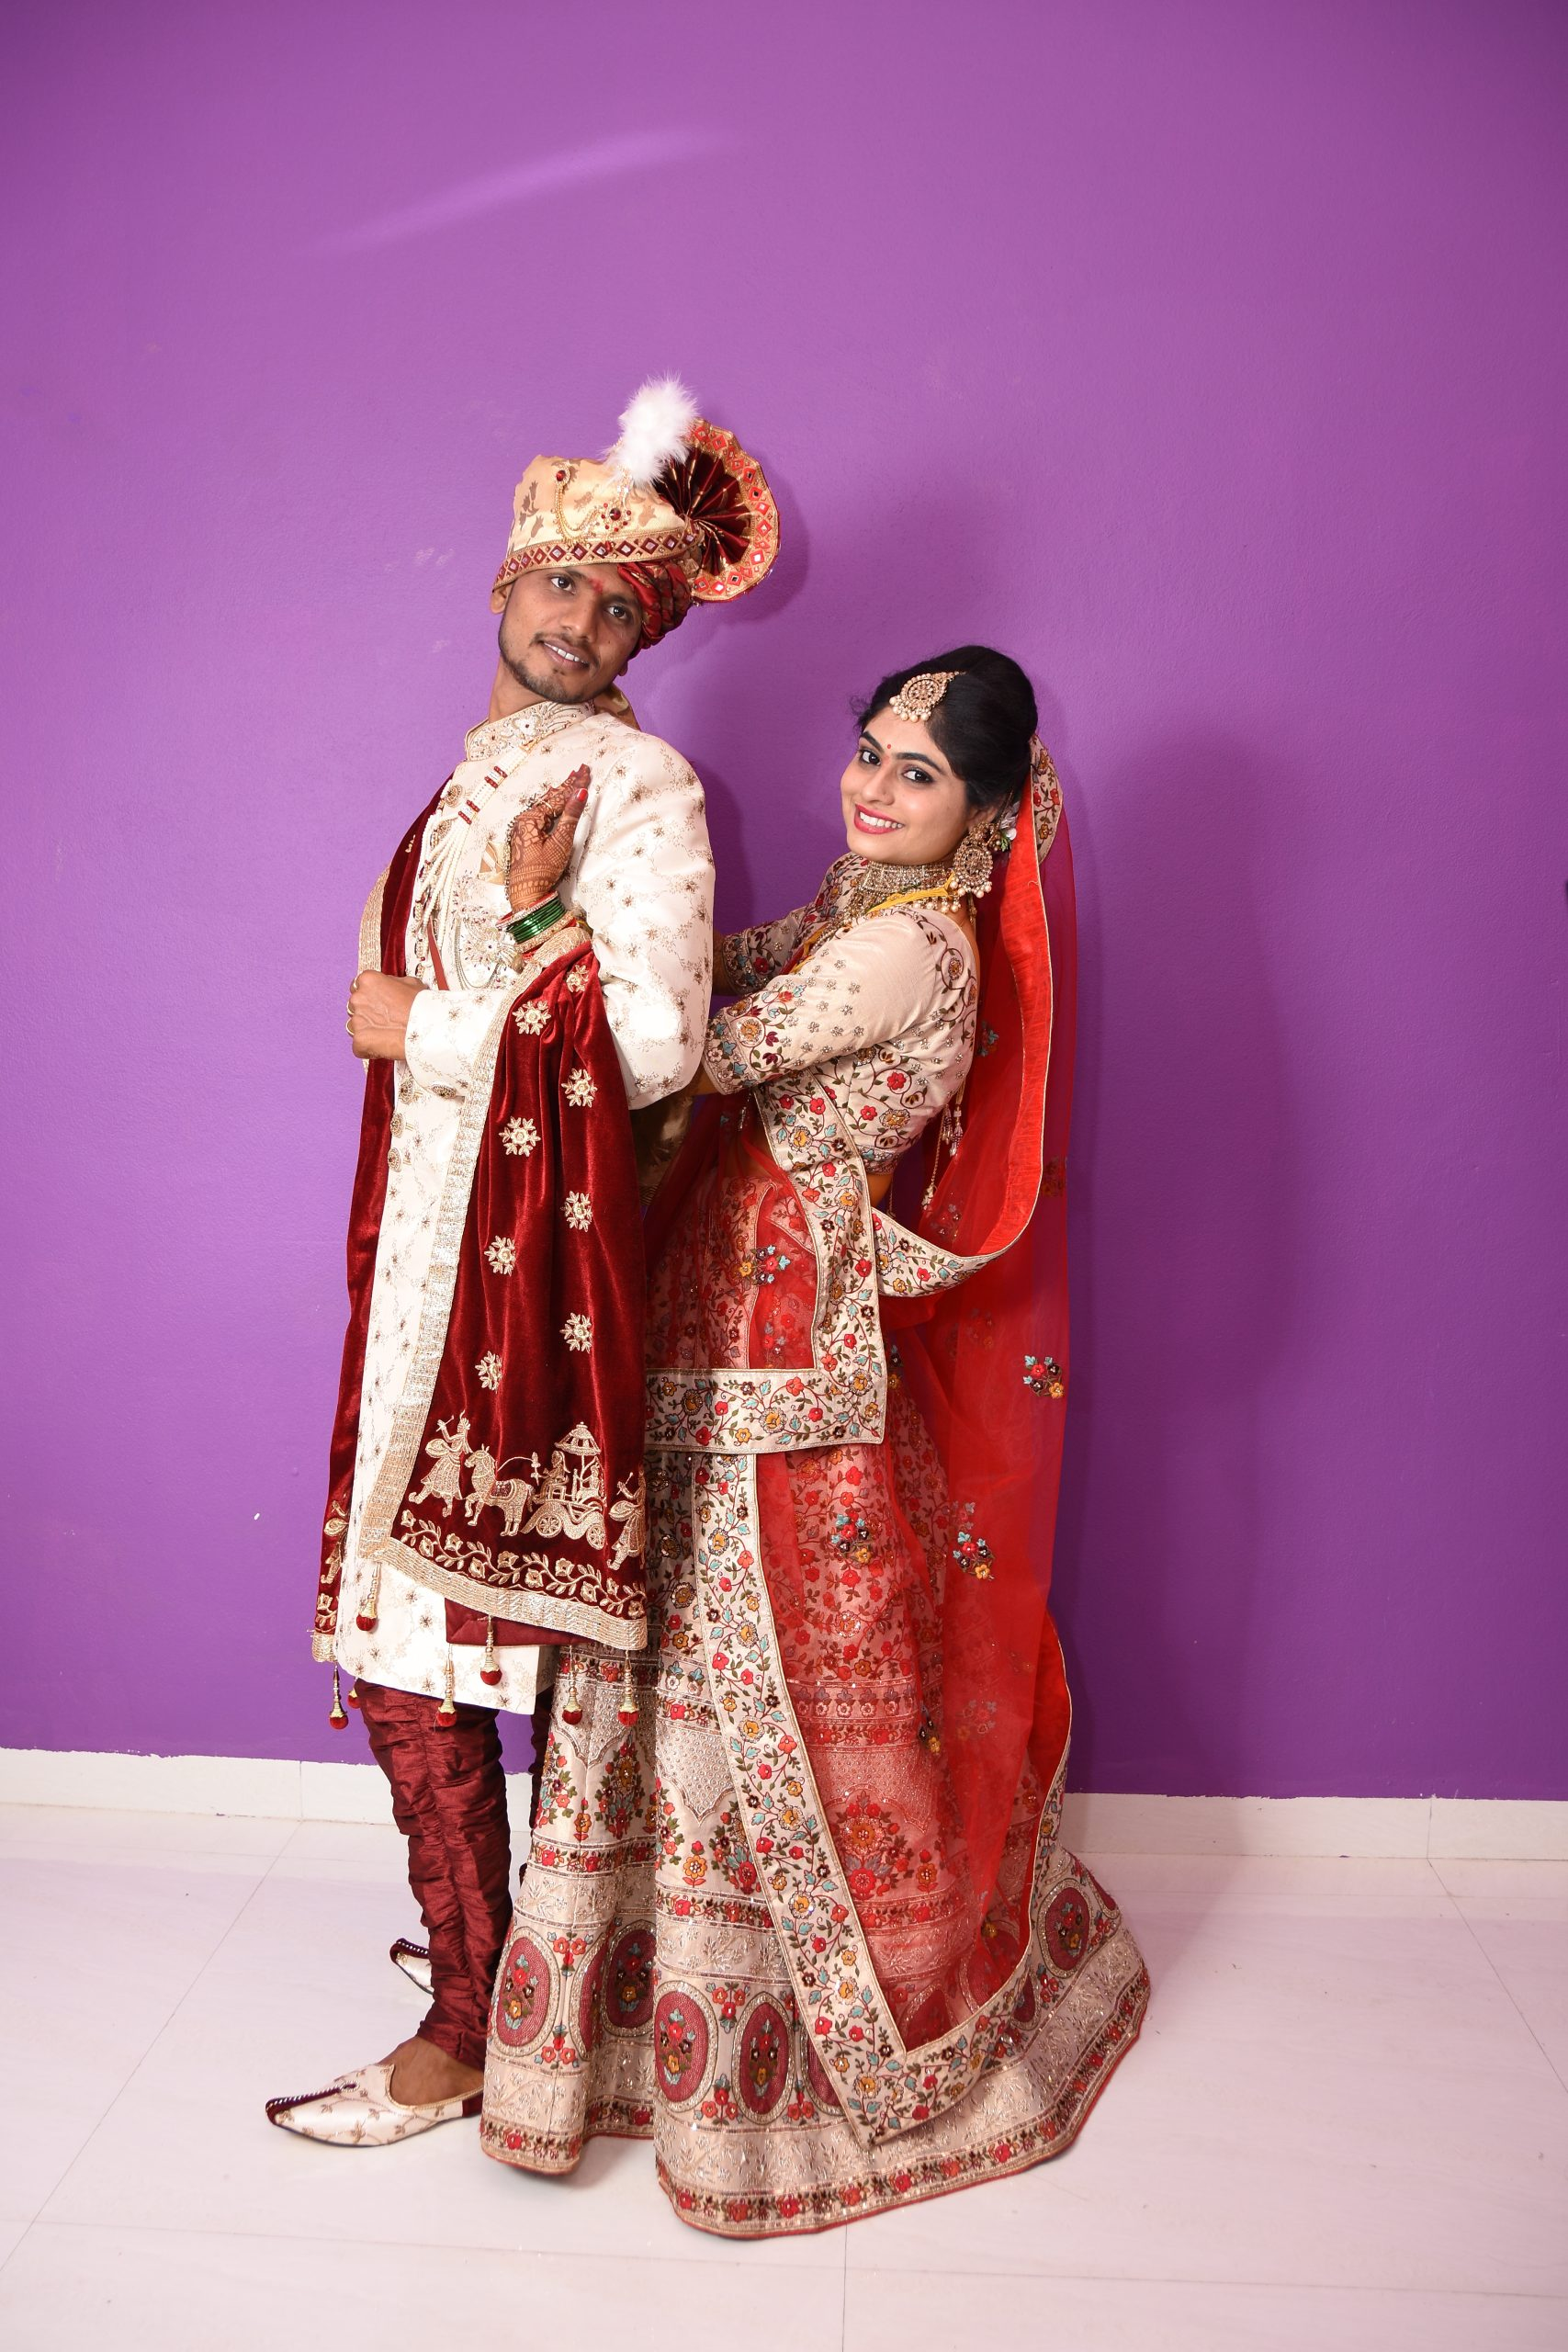 Wedding couples posing